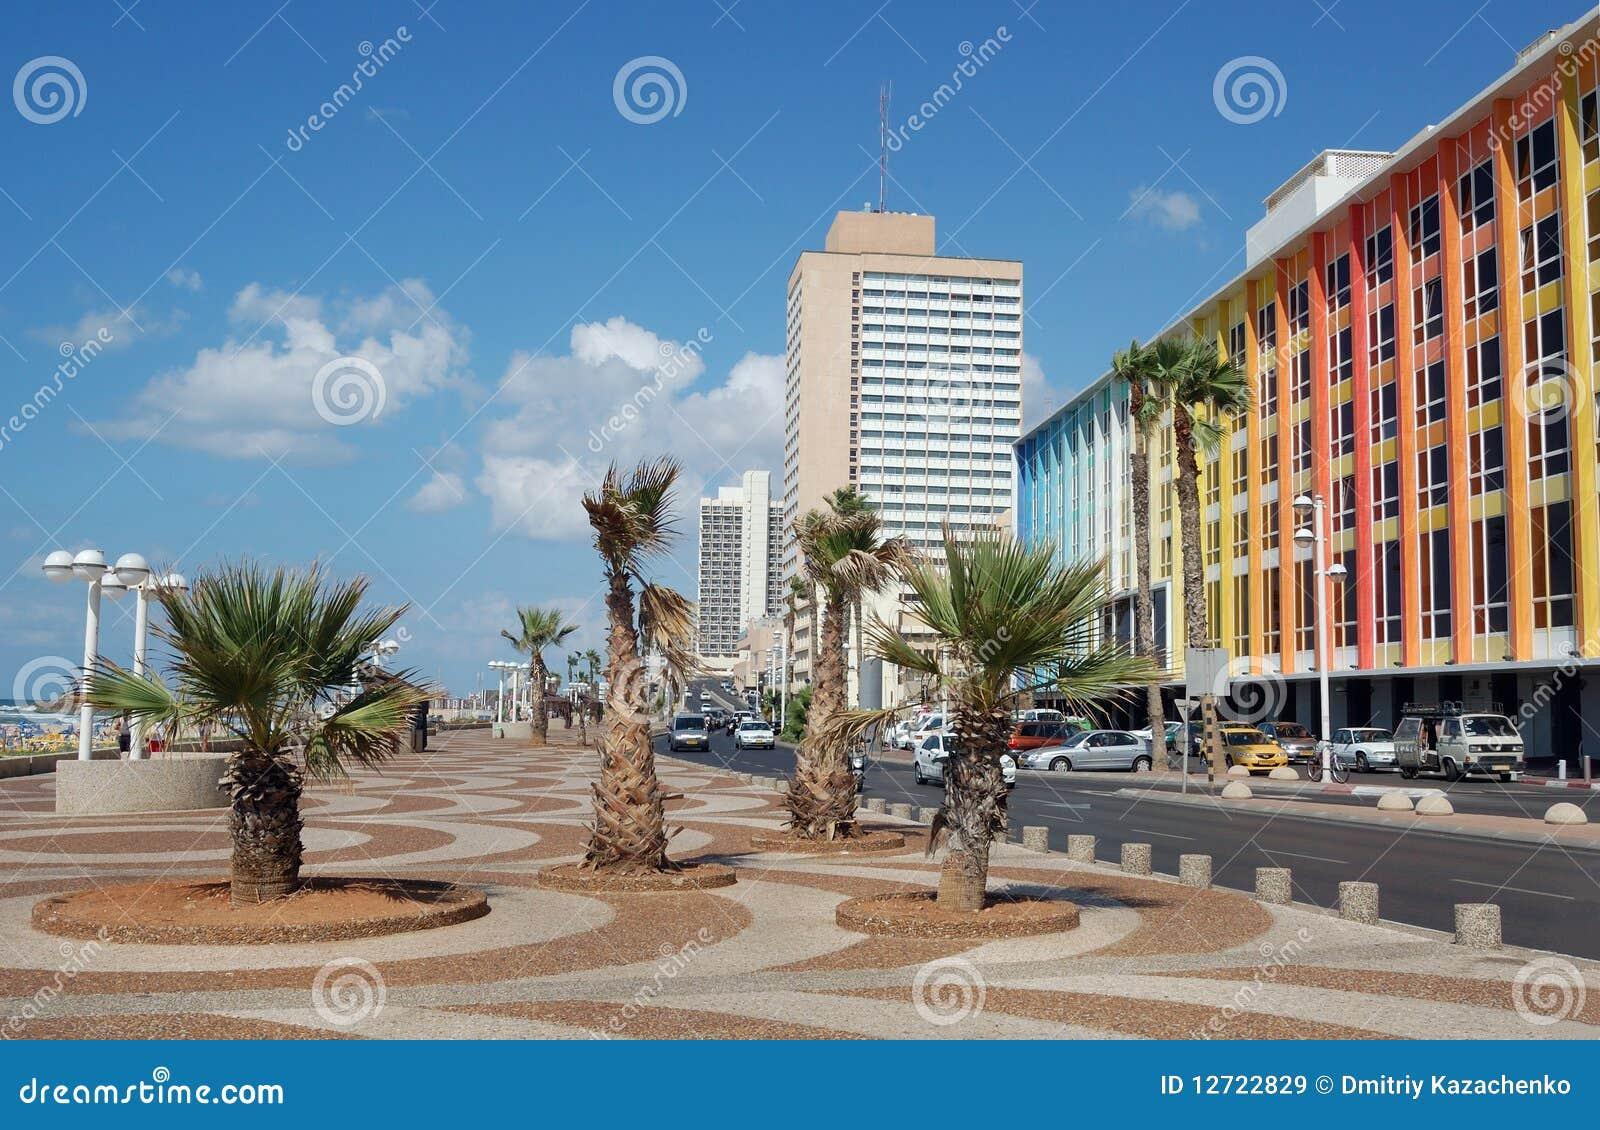 Avive沿海岸区tel